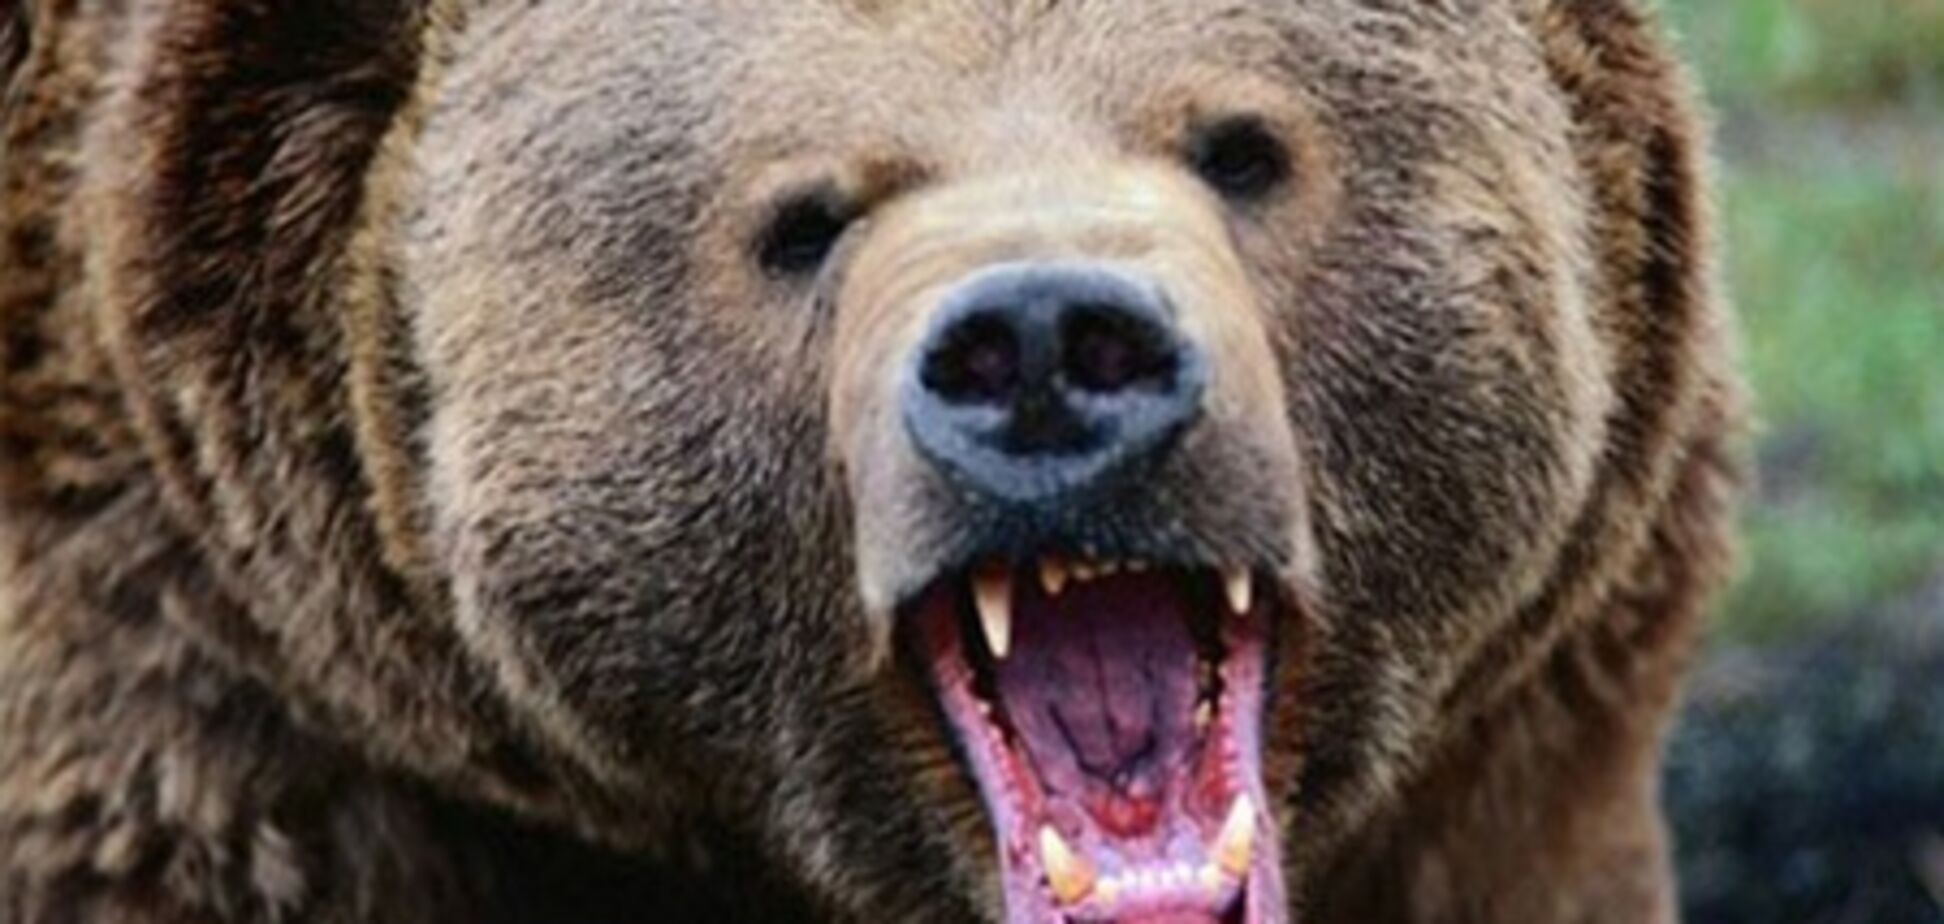 В Норвегии в дом вломились медведи: съели мед и выпили 100 банок пива